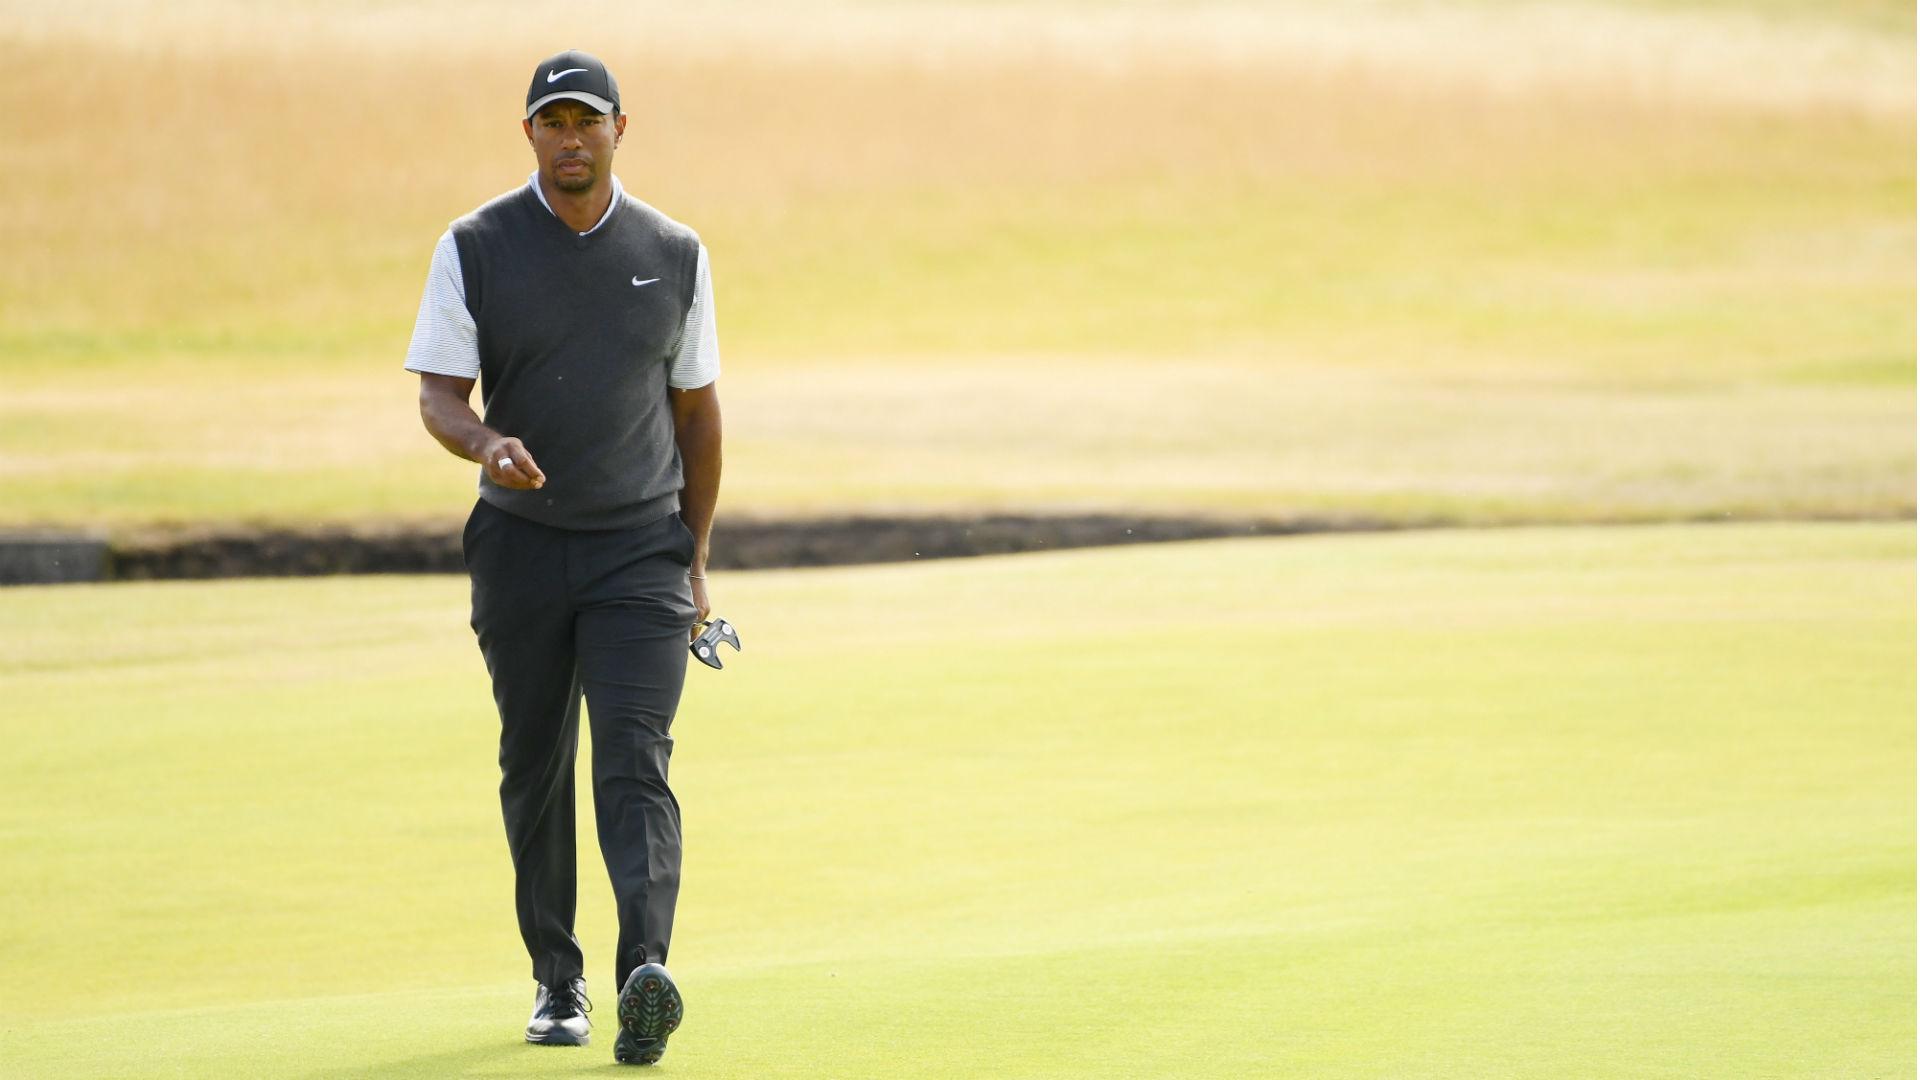 Tiger-Woods-072118-FTR-Getty